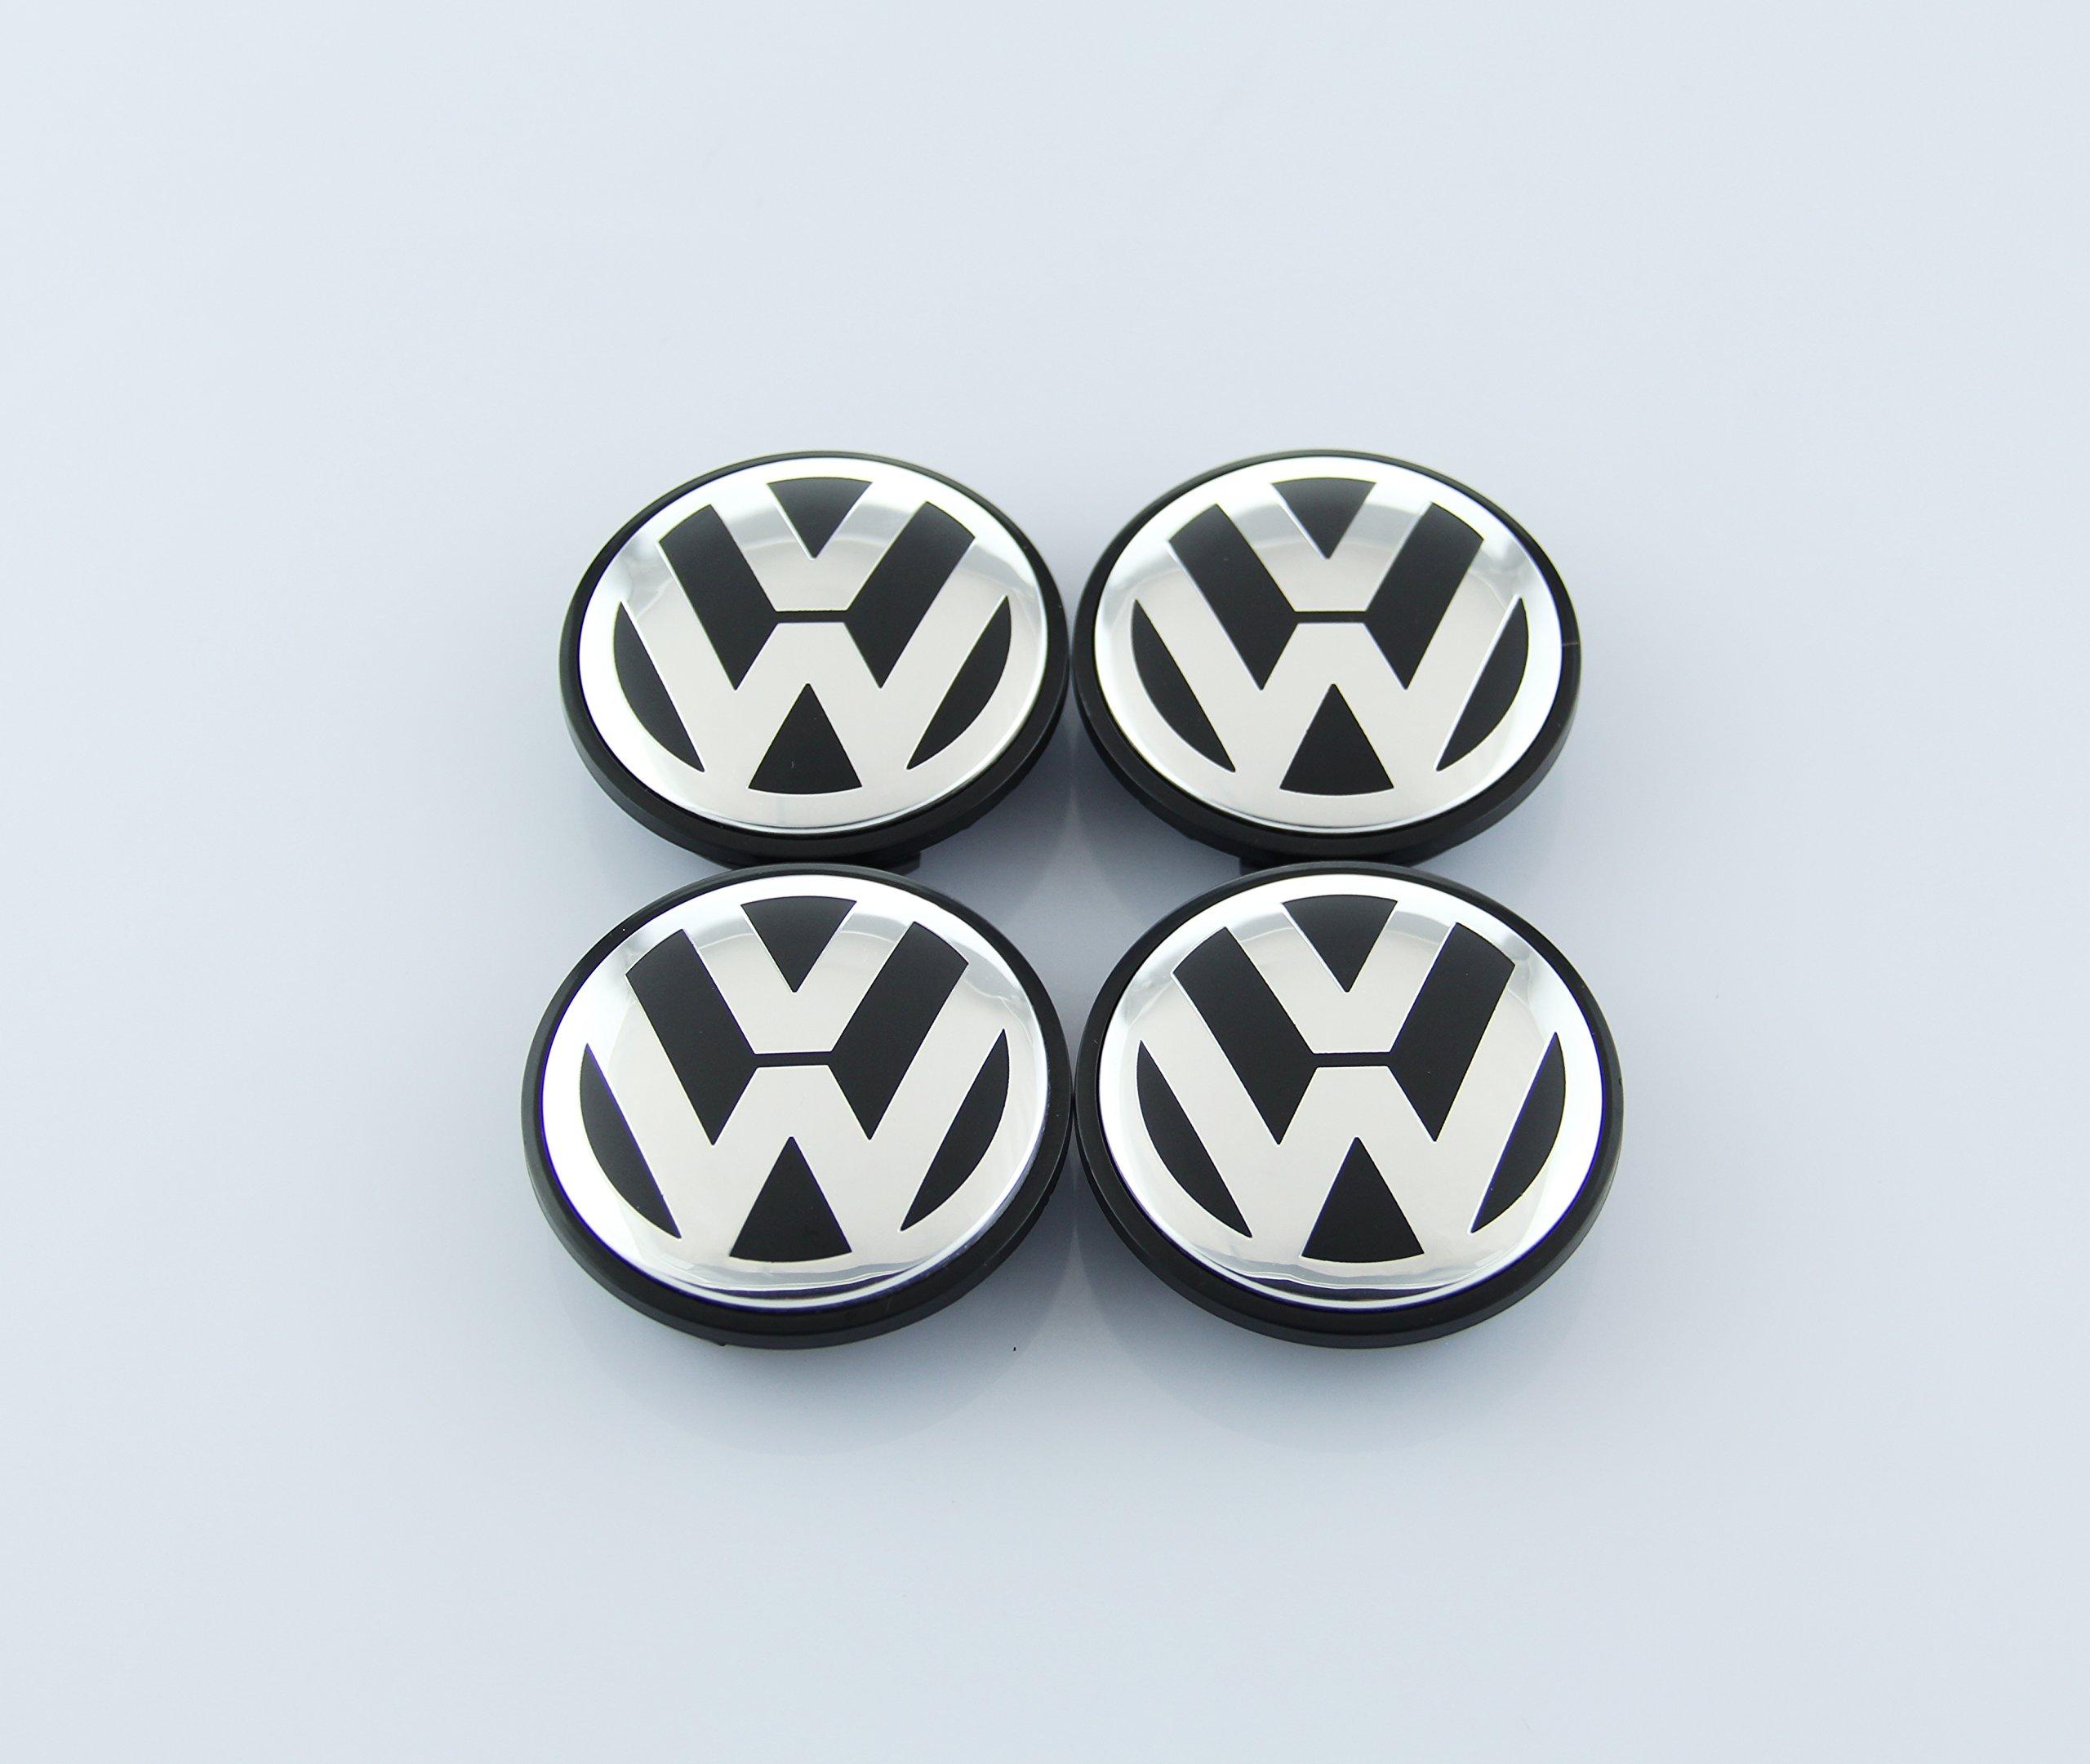 ZZHF1 VW Wheel Center Caps 65mm for Volkswagen Beetle CC EOS GTI Golf Jetta Passat Phaeton Tiguan 3B7601171 (4Pcs)